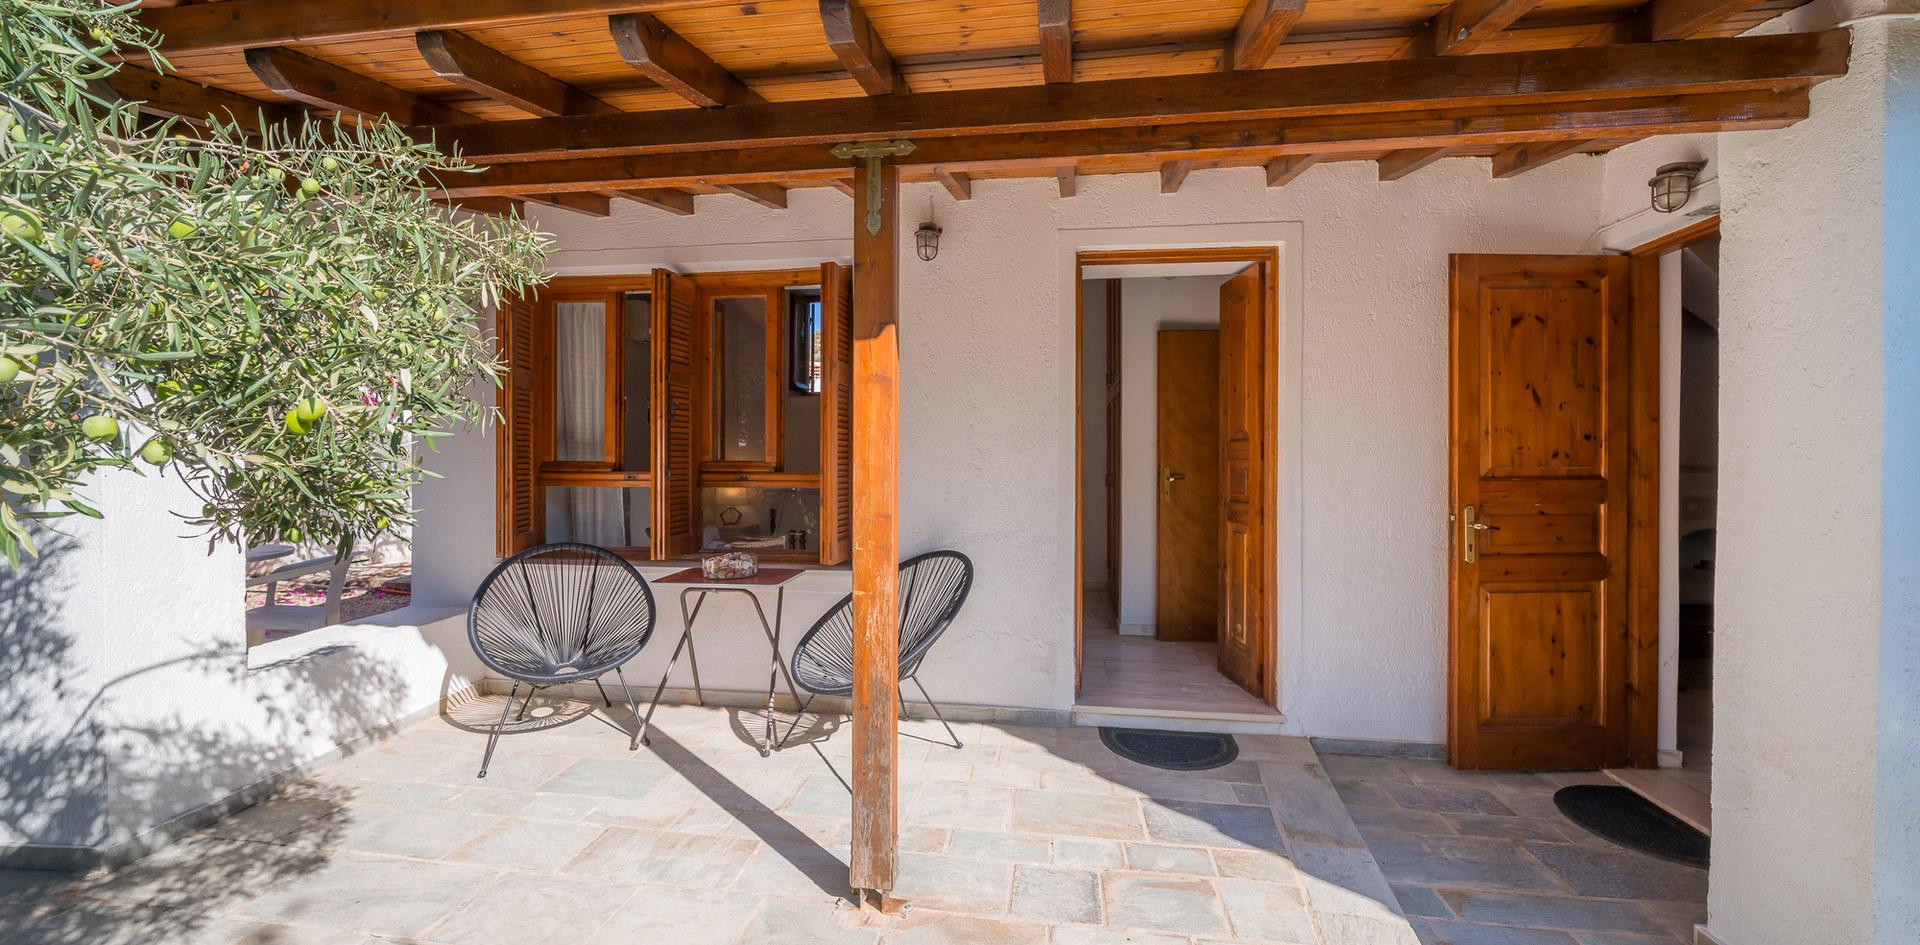 Aegina holiday rental